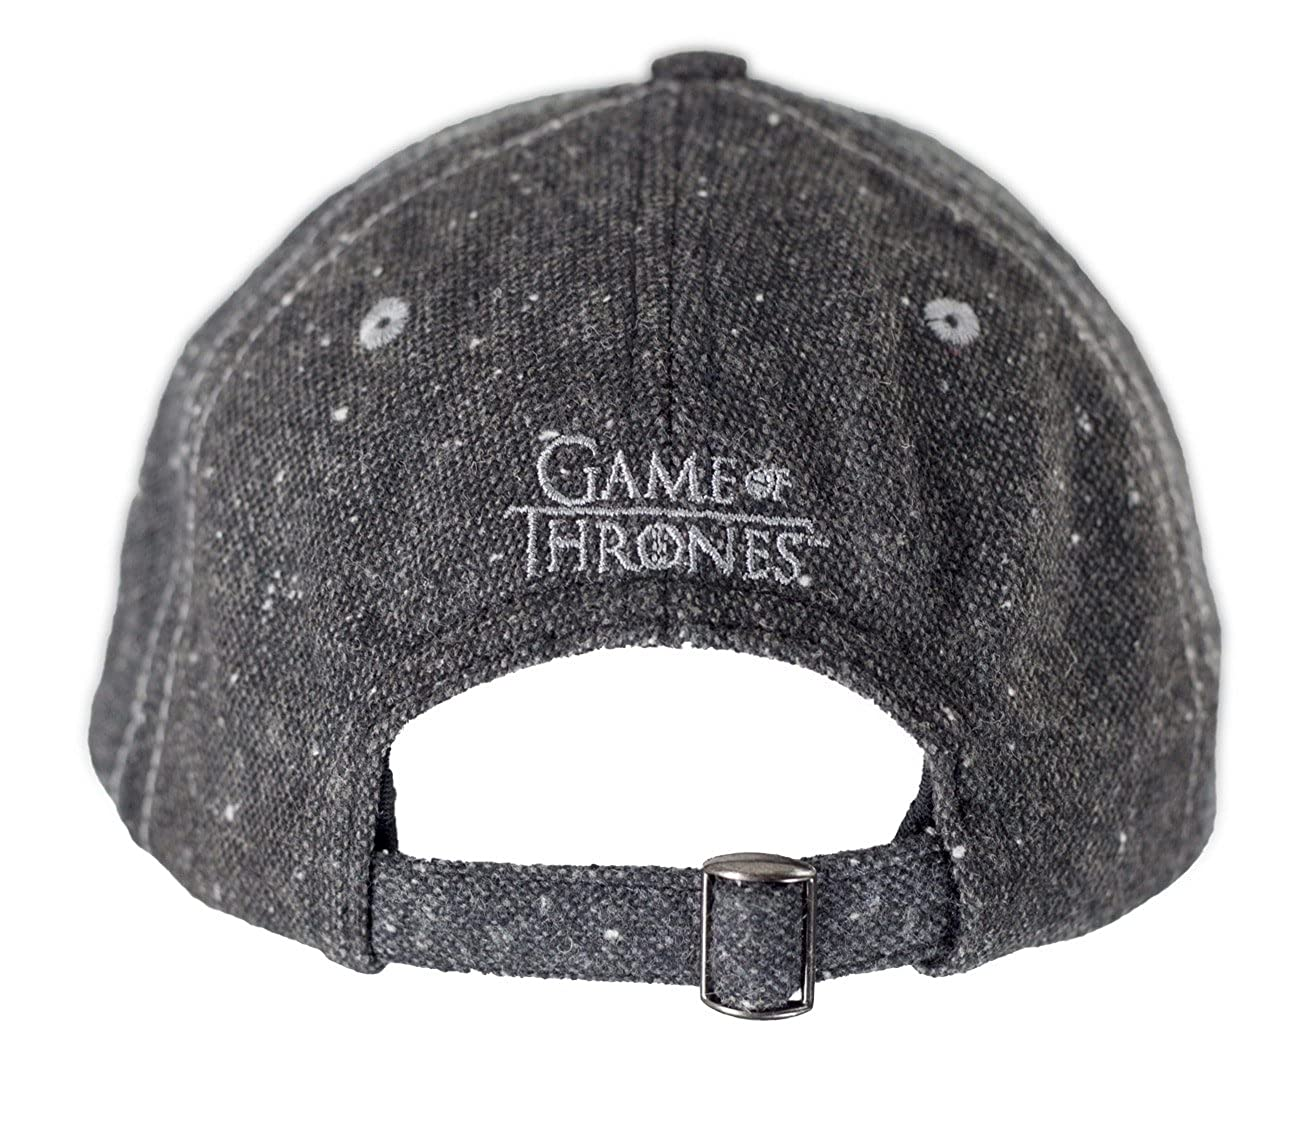 3c99b8da926 Amazon.com  Game of Thrones Flecked Fabric Premium Baseball Hat (Stark)   Clothing